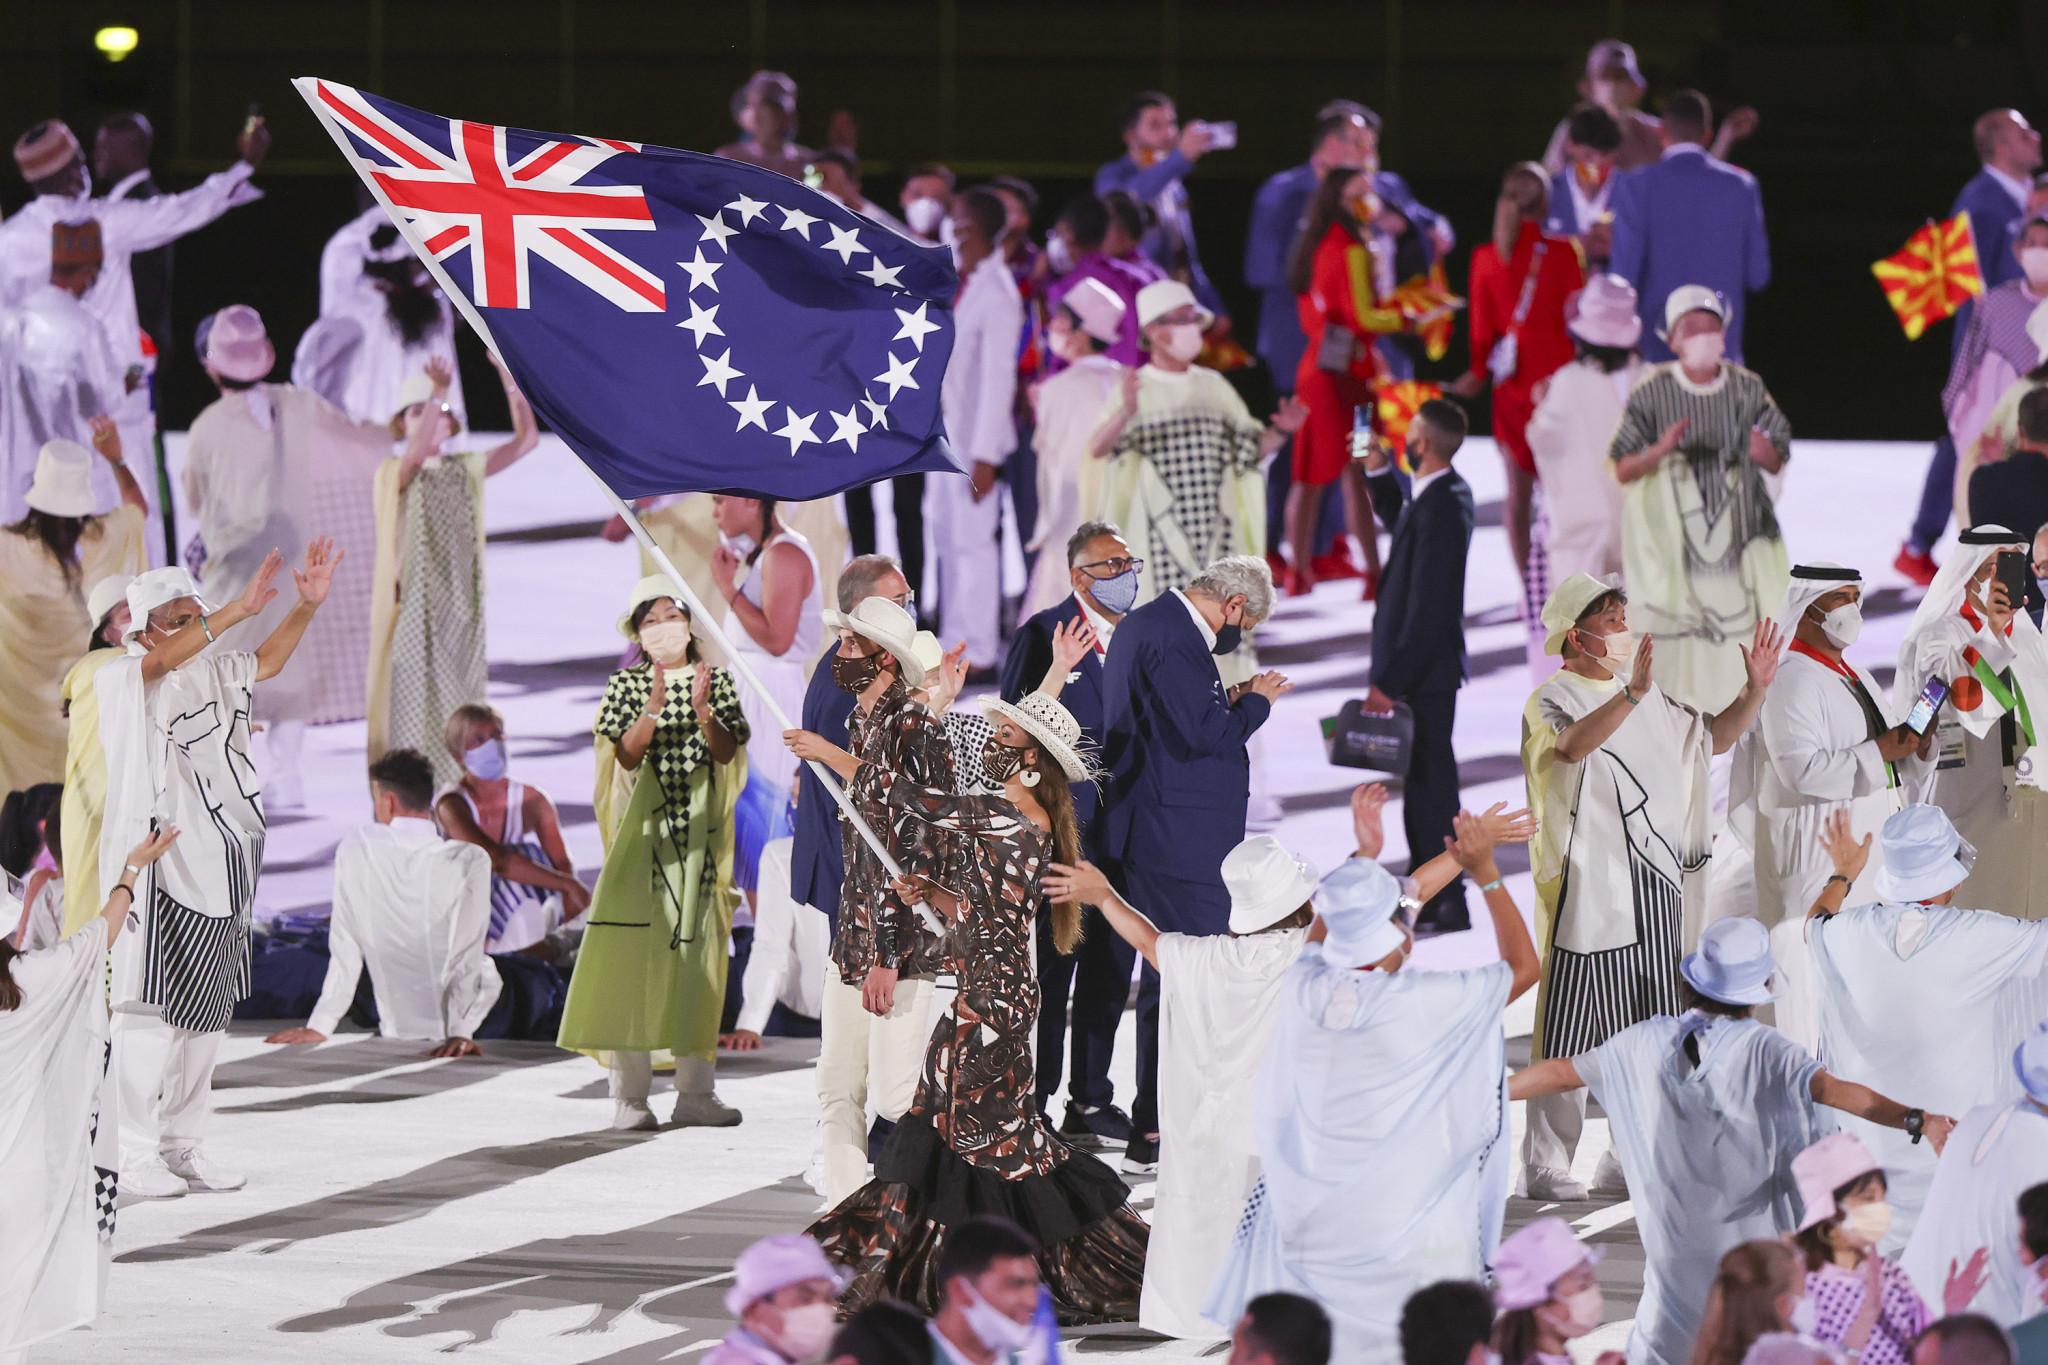 Cook Islands Olympians finally return home after Tokyo 2020 quarantine ordeal